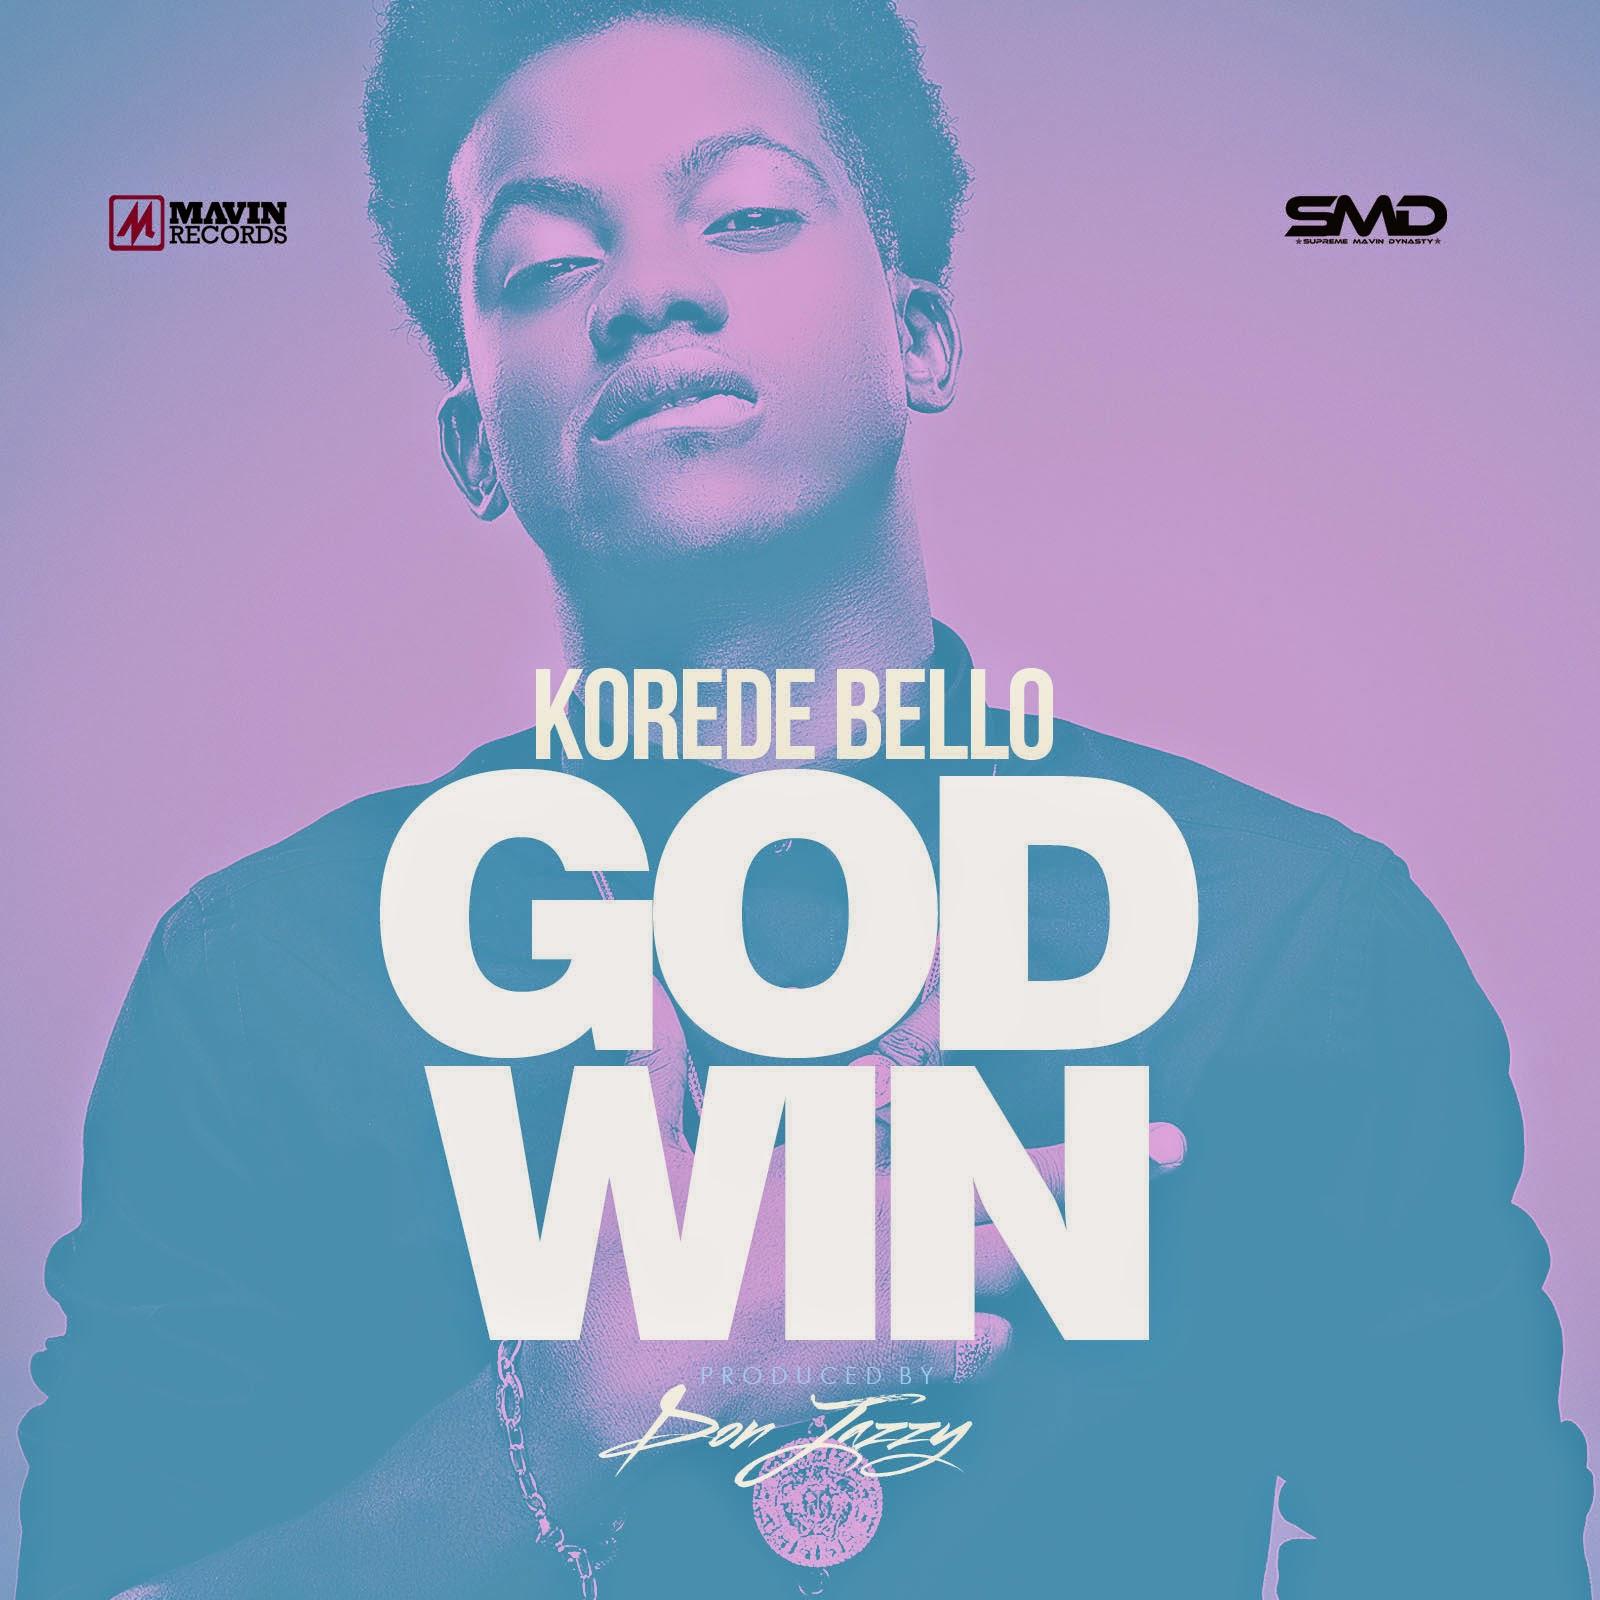 Korede Bello – Godwin [Prod by. Don Jazzy]